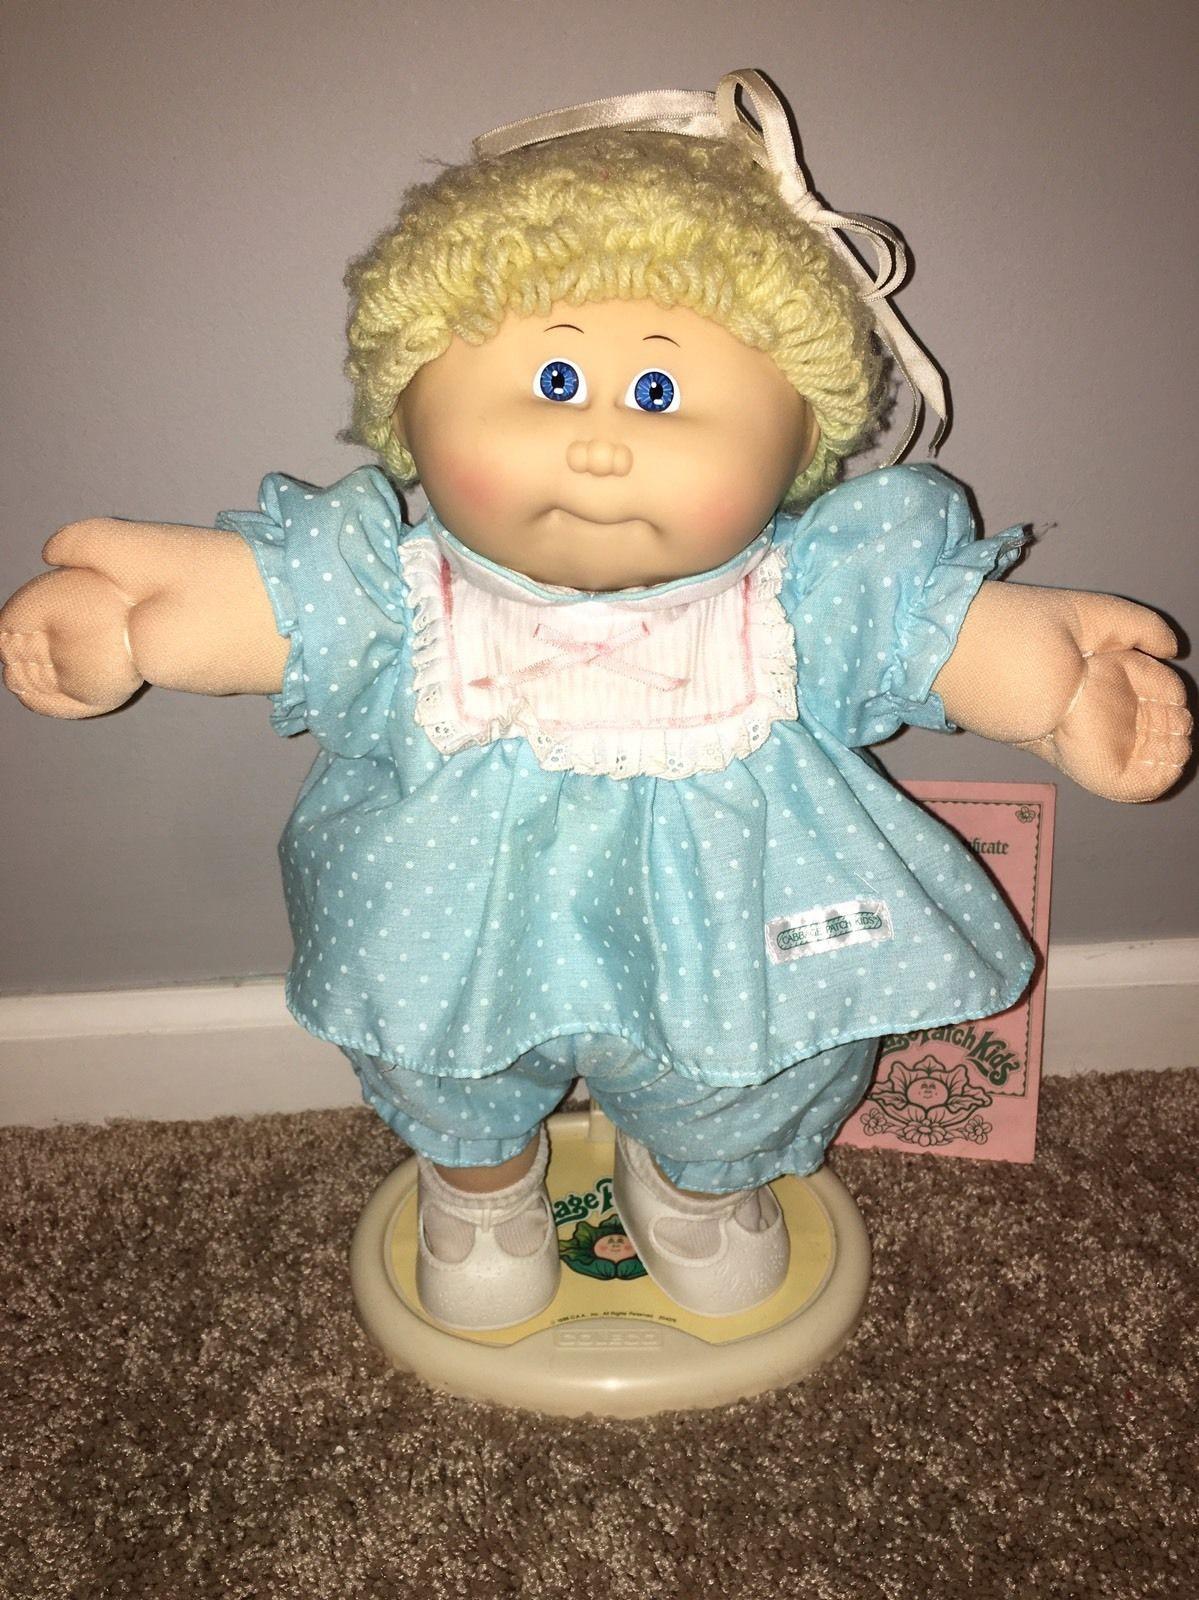 Vtg Coleco Cabbage Patch Kids Doll Girl Red Dress Blonde Hair Blue Eyes Ebay Vintage Cabbage Patch Dolls Cabbage Patch Babies Cabbage Patch Dolls